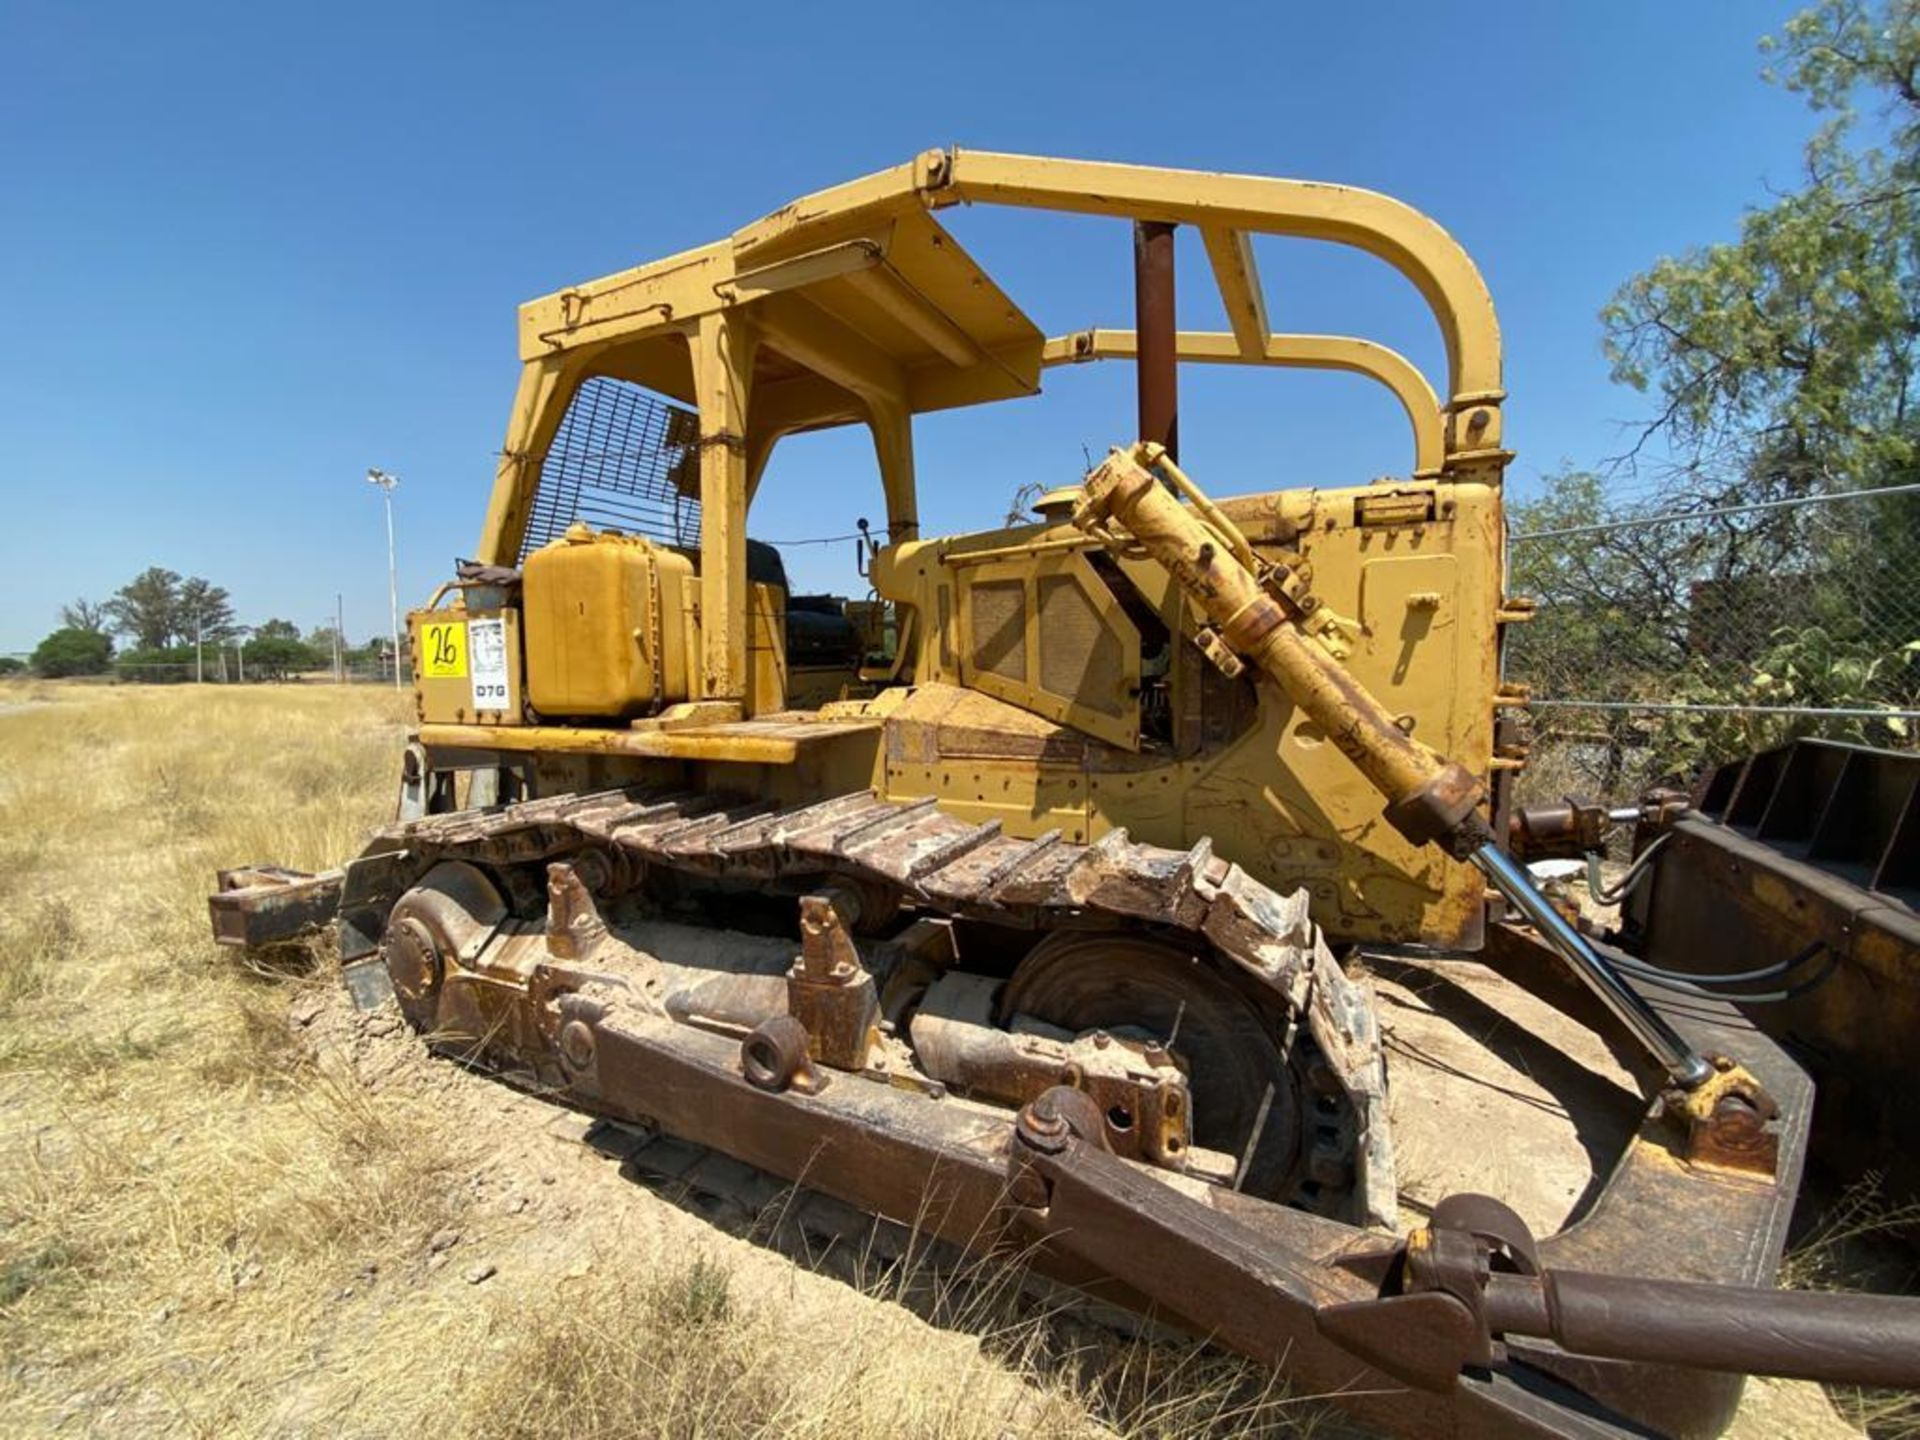 Caterpillar D7G Bulldozer, Serial number 92V5897, Diesel motor - Image 15 of 48